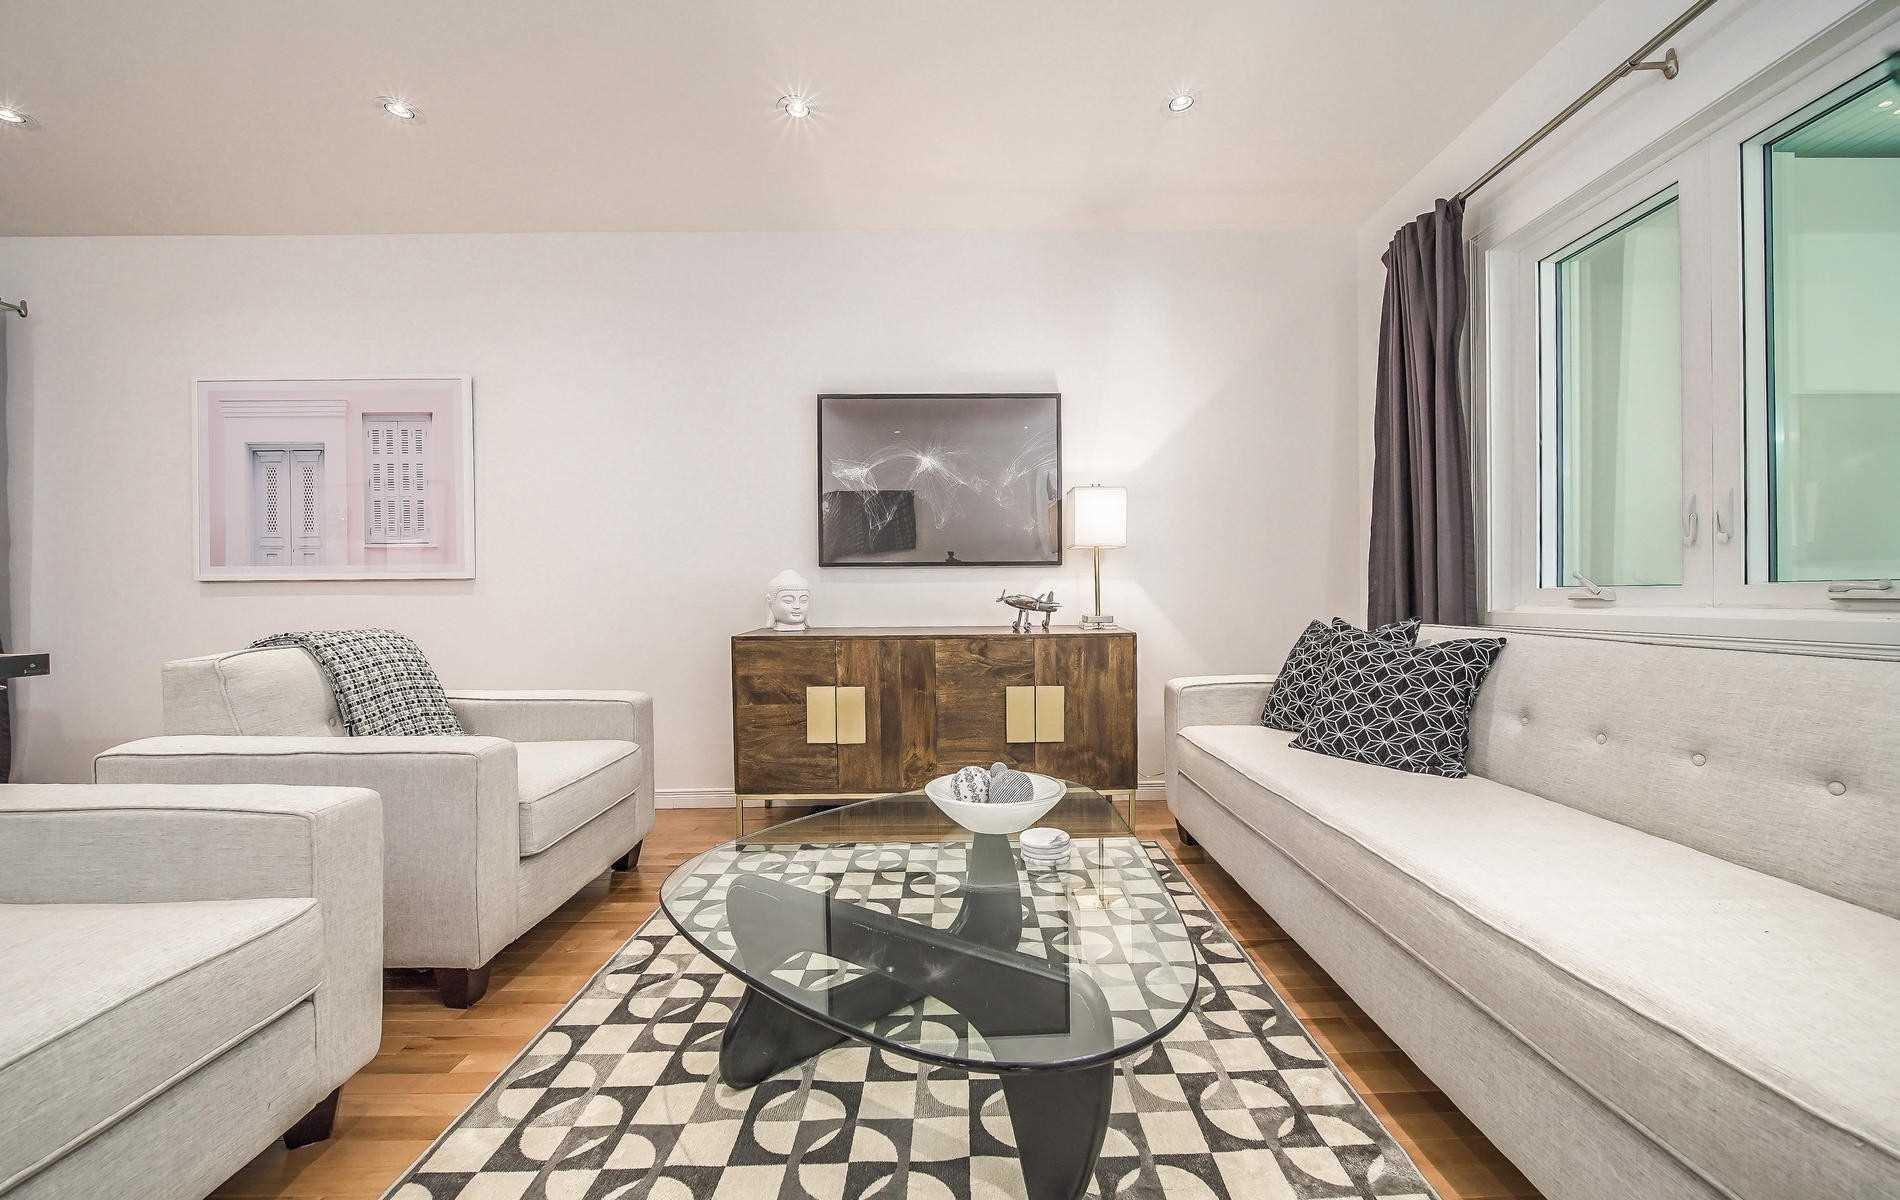 Photo 3: Photos: 64 Larchmount Avenue in Toronto: South Riverdale House (2-Storey) for sale (Toronto E01)  : MLS®# E4489752